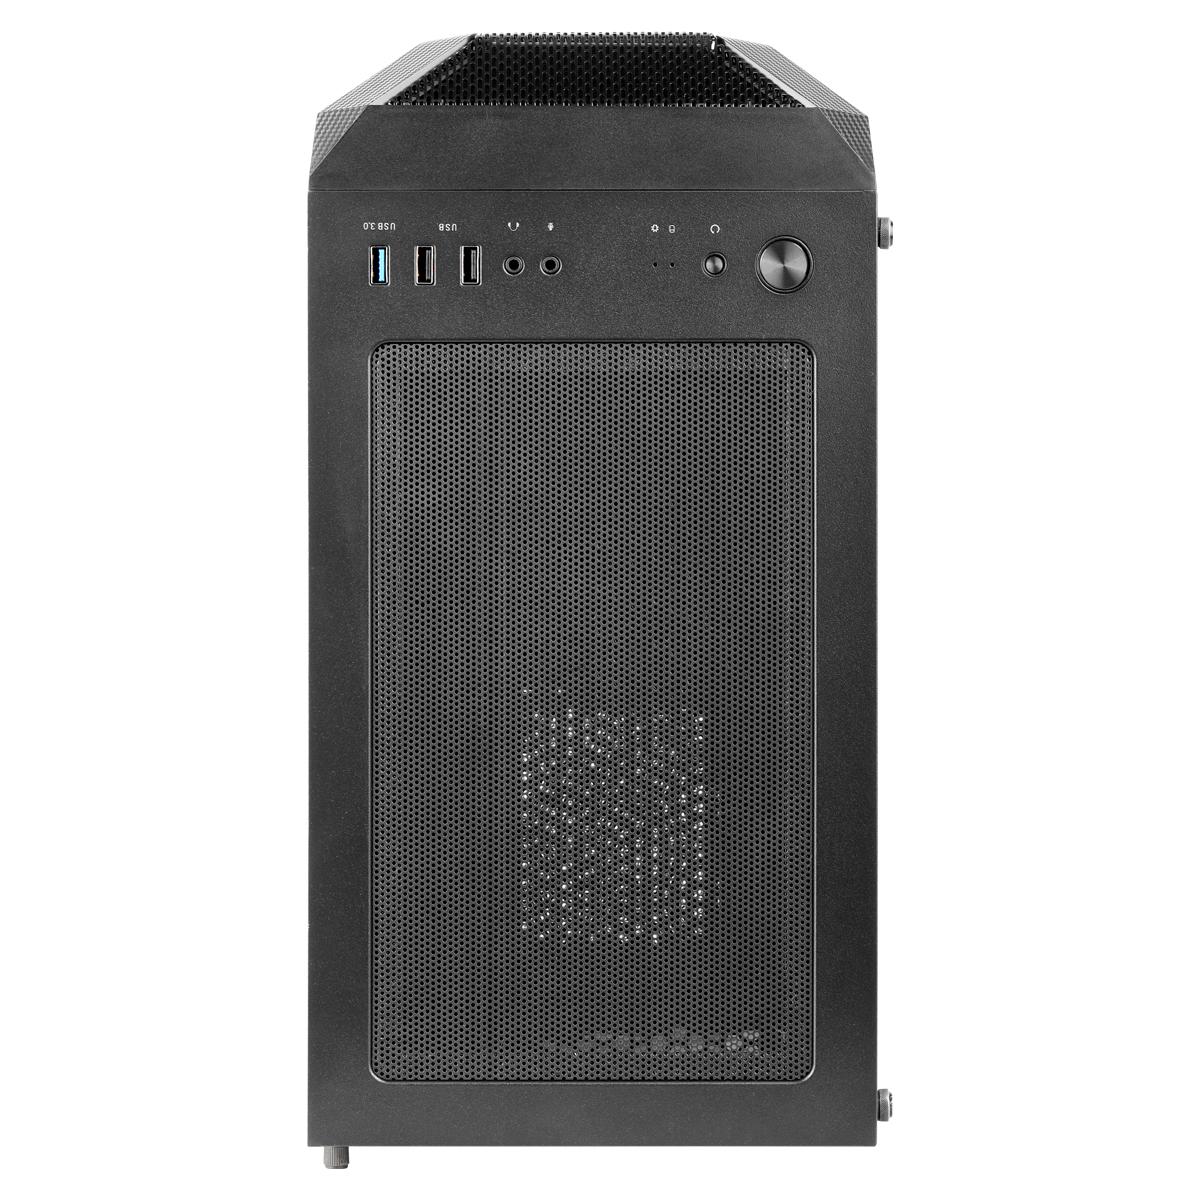 Caja de torre mediana Helos 250X Top dust filter